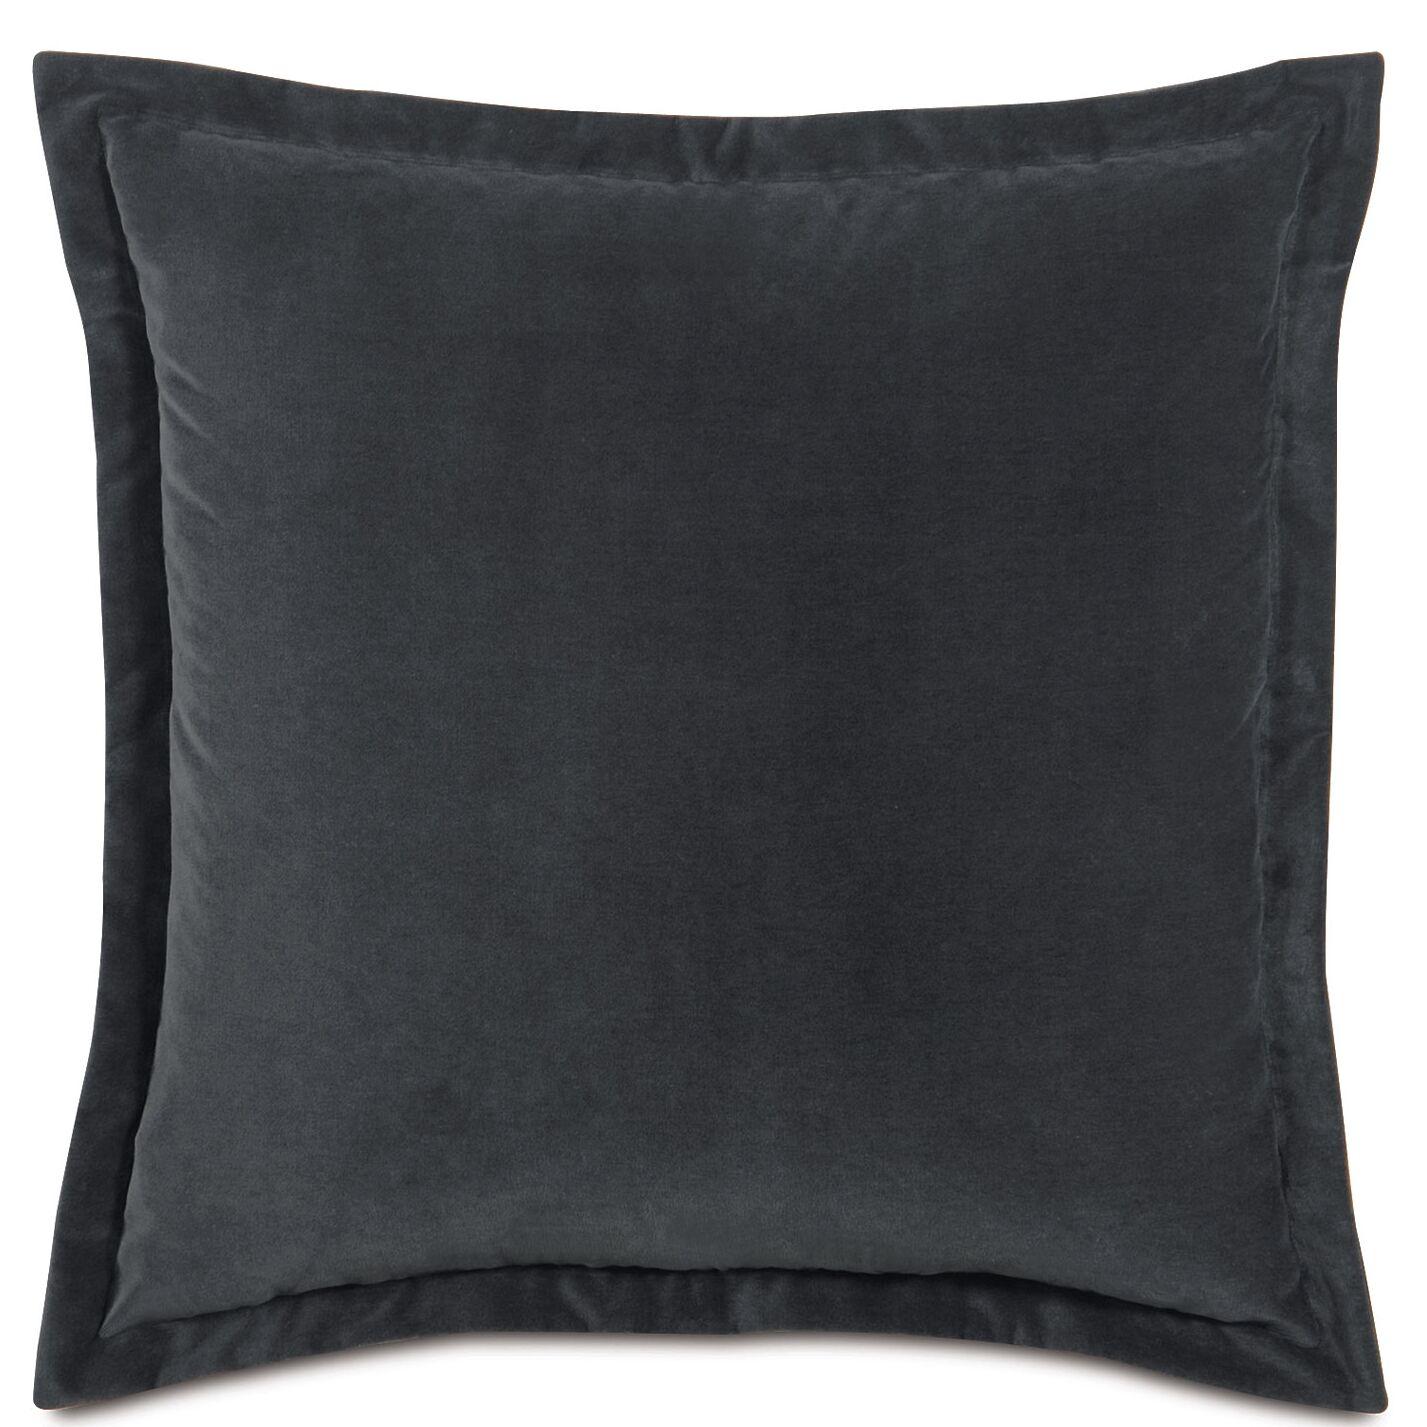 Jackson Sham Size: Standard, Color: Charcoal